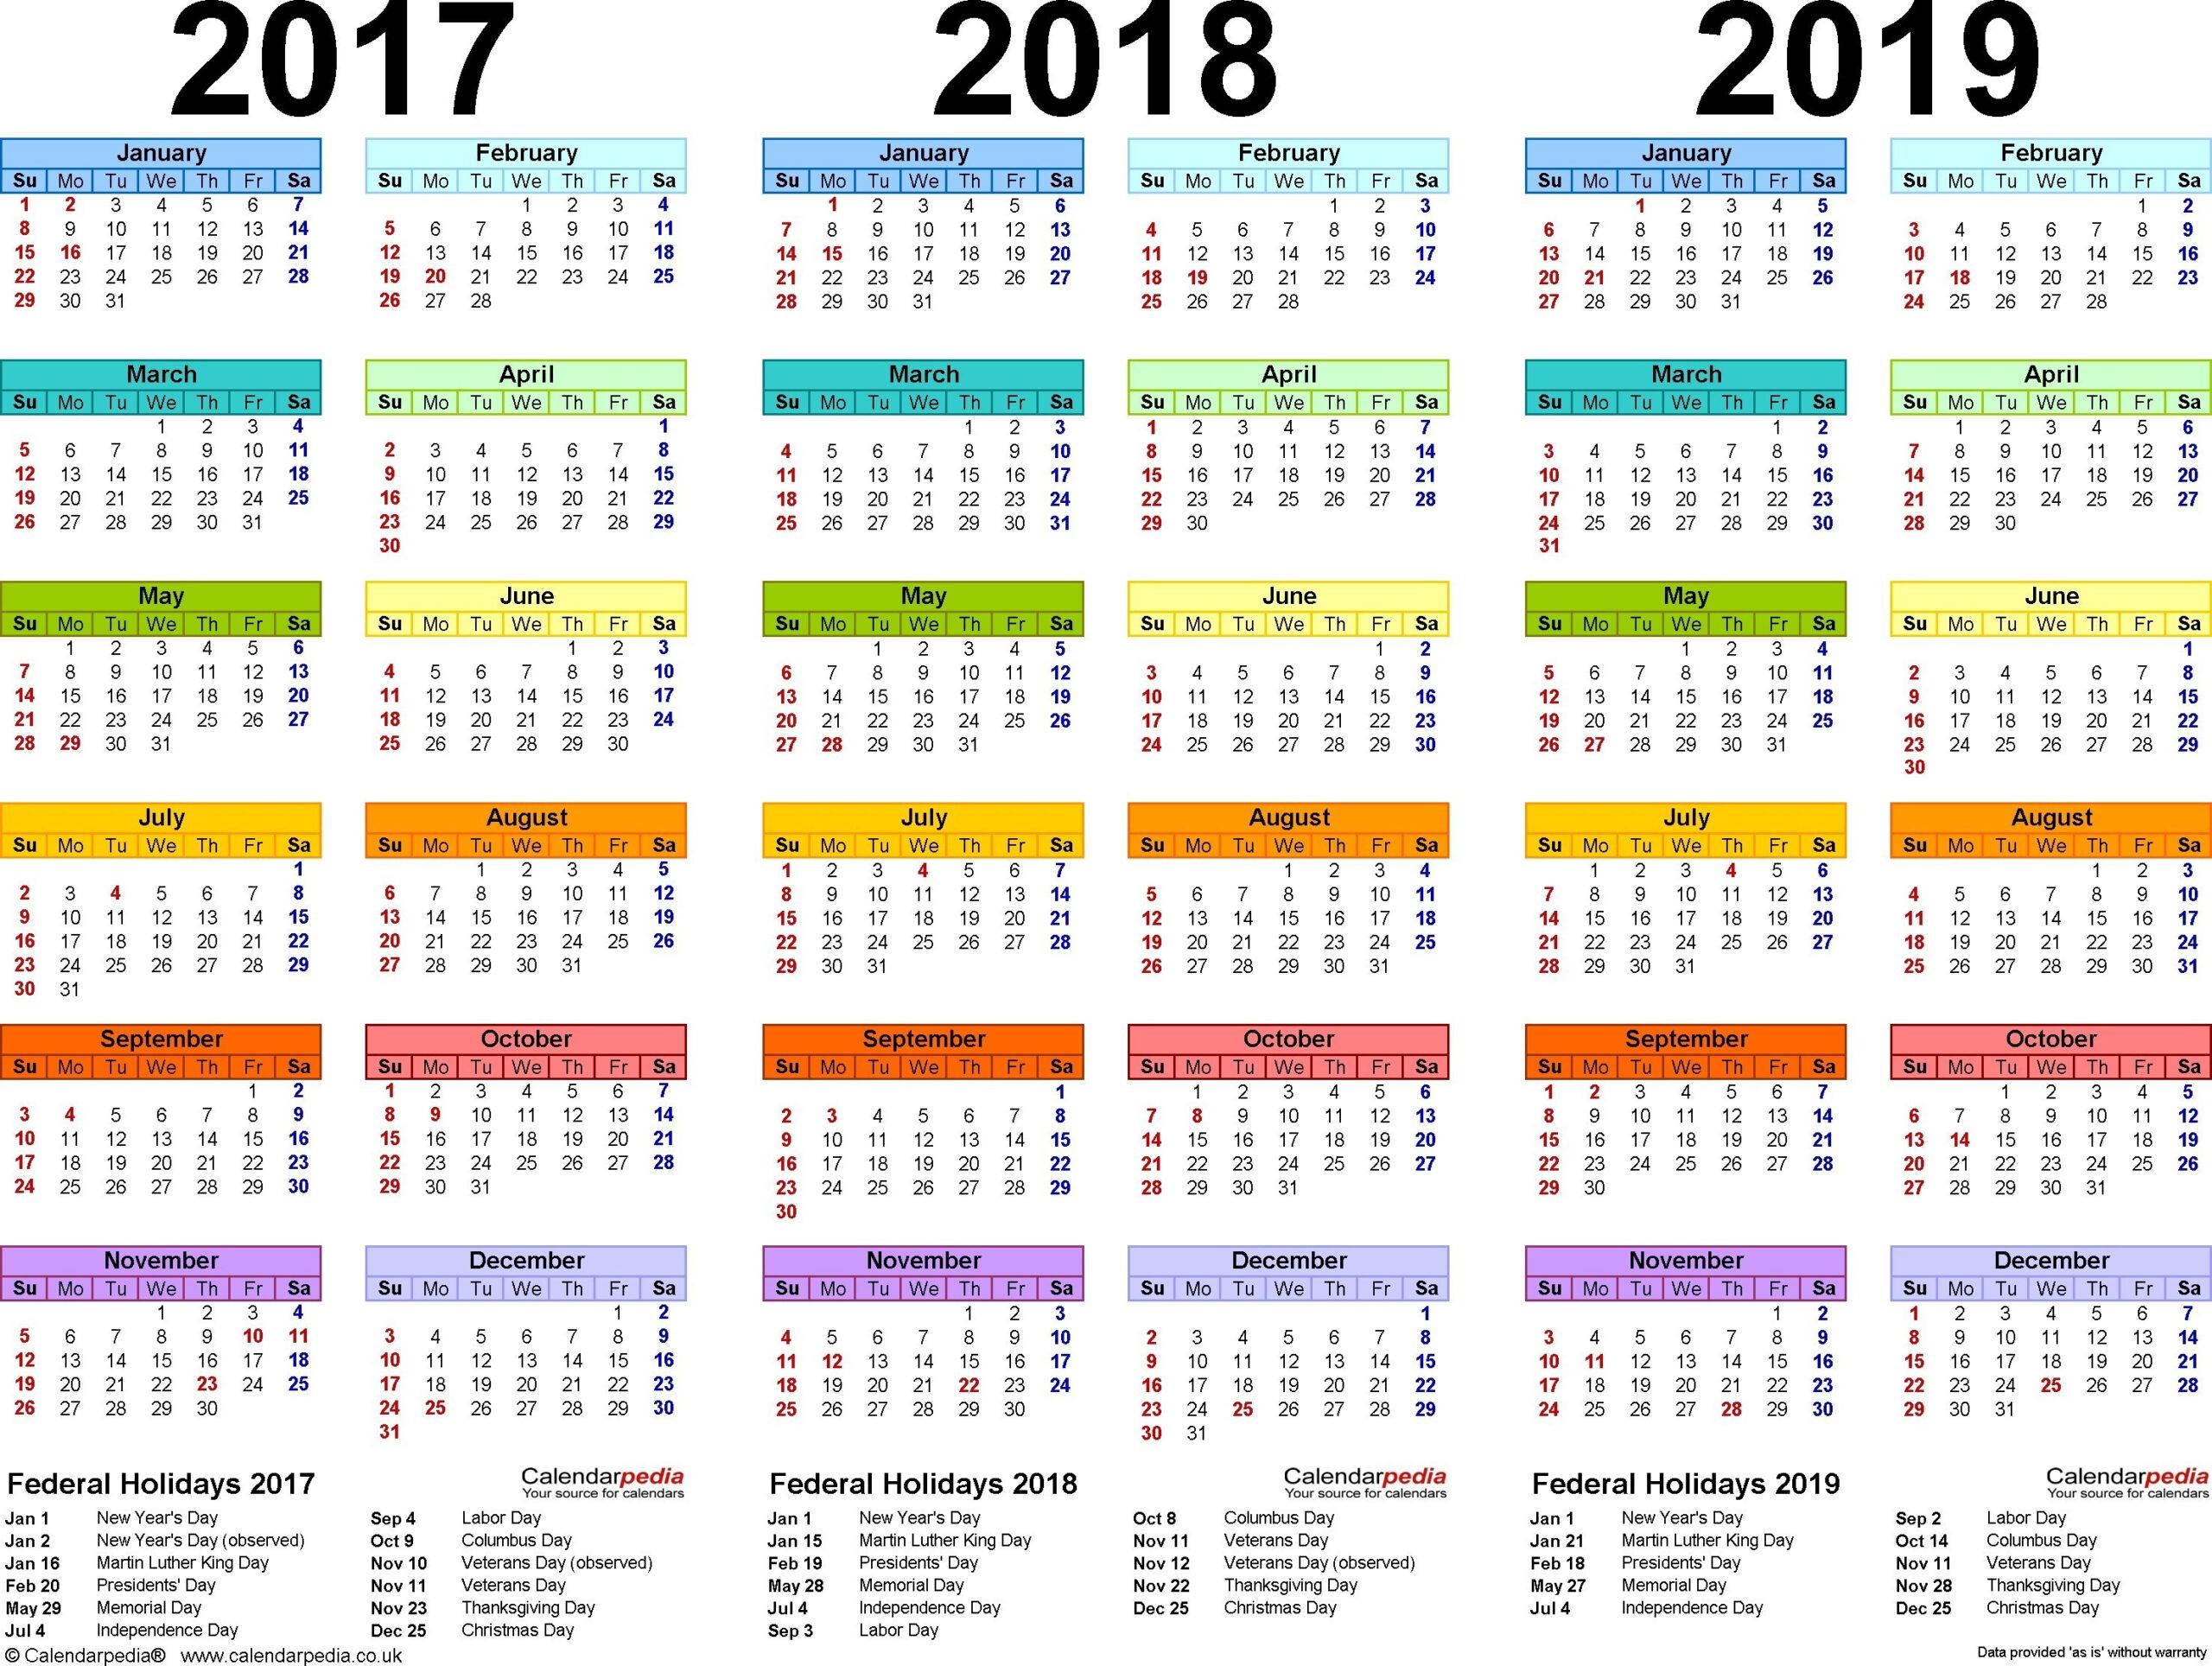 Depo Shot Calender July 2019 - December 2019 - Calendar  Depo Provera December 4,2021 Next Due